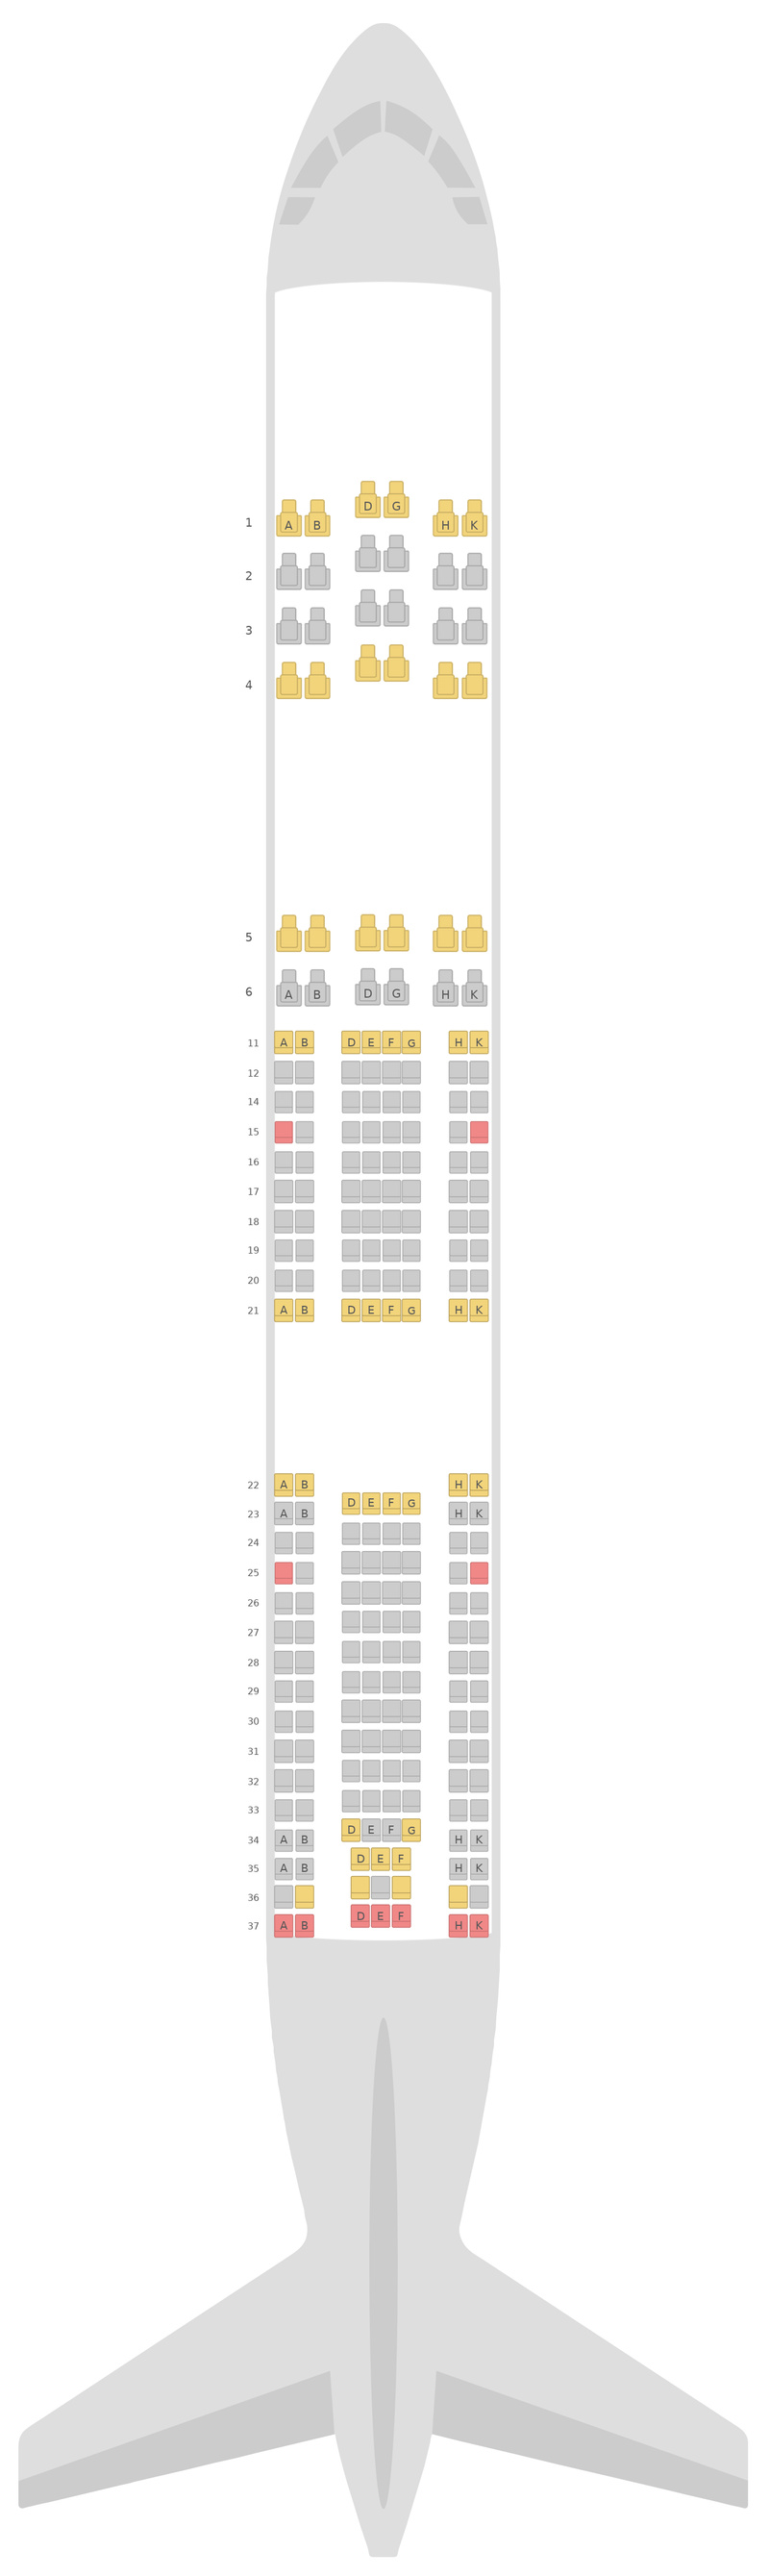 Mapa de asientos Airbus A340-500 (345) Azerbaijan Airlines